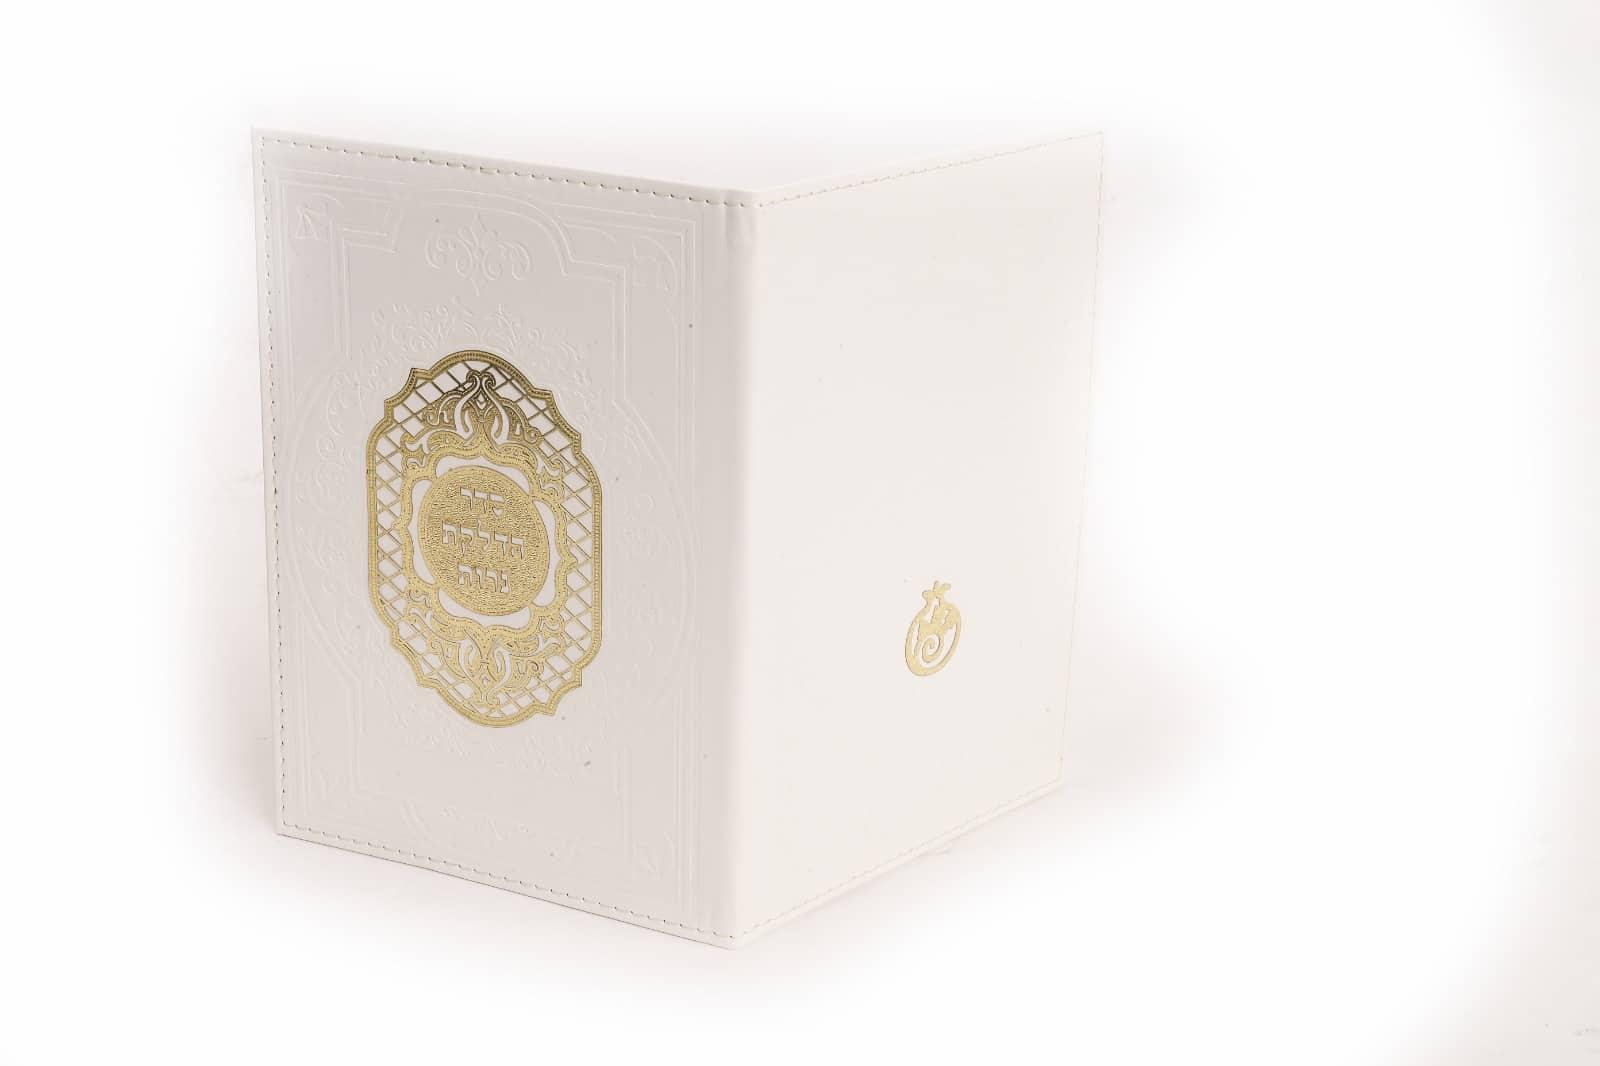 Bat Mitzvah Gift Set - Silver Candlestick Holders, Sabbath Booklet with Leather Cover and Siddur Kavanat Halev Jewish Prayer Book